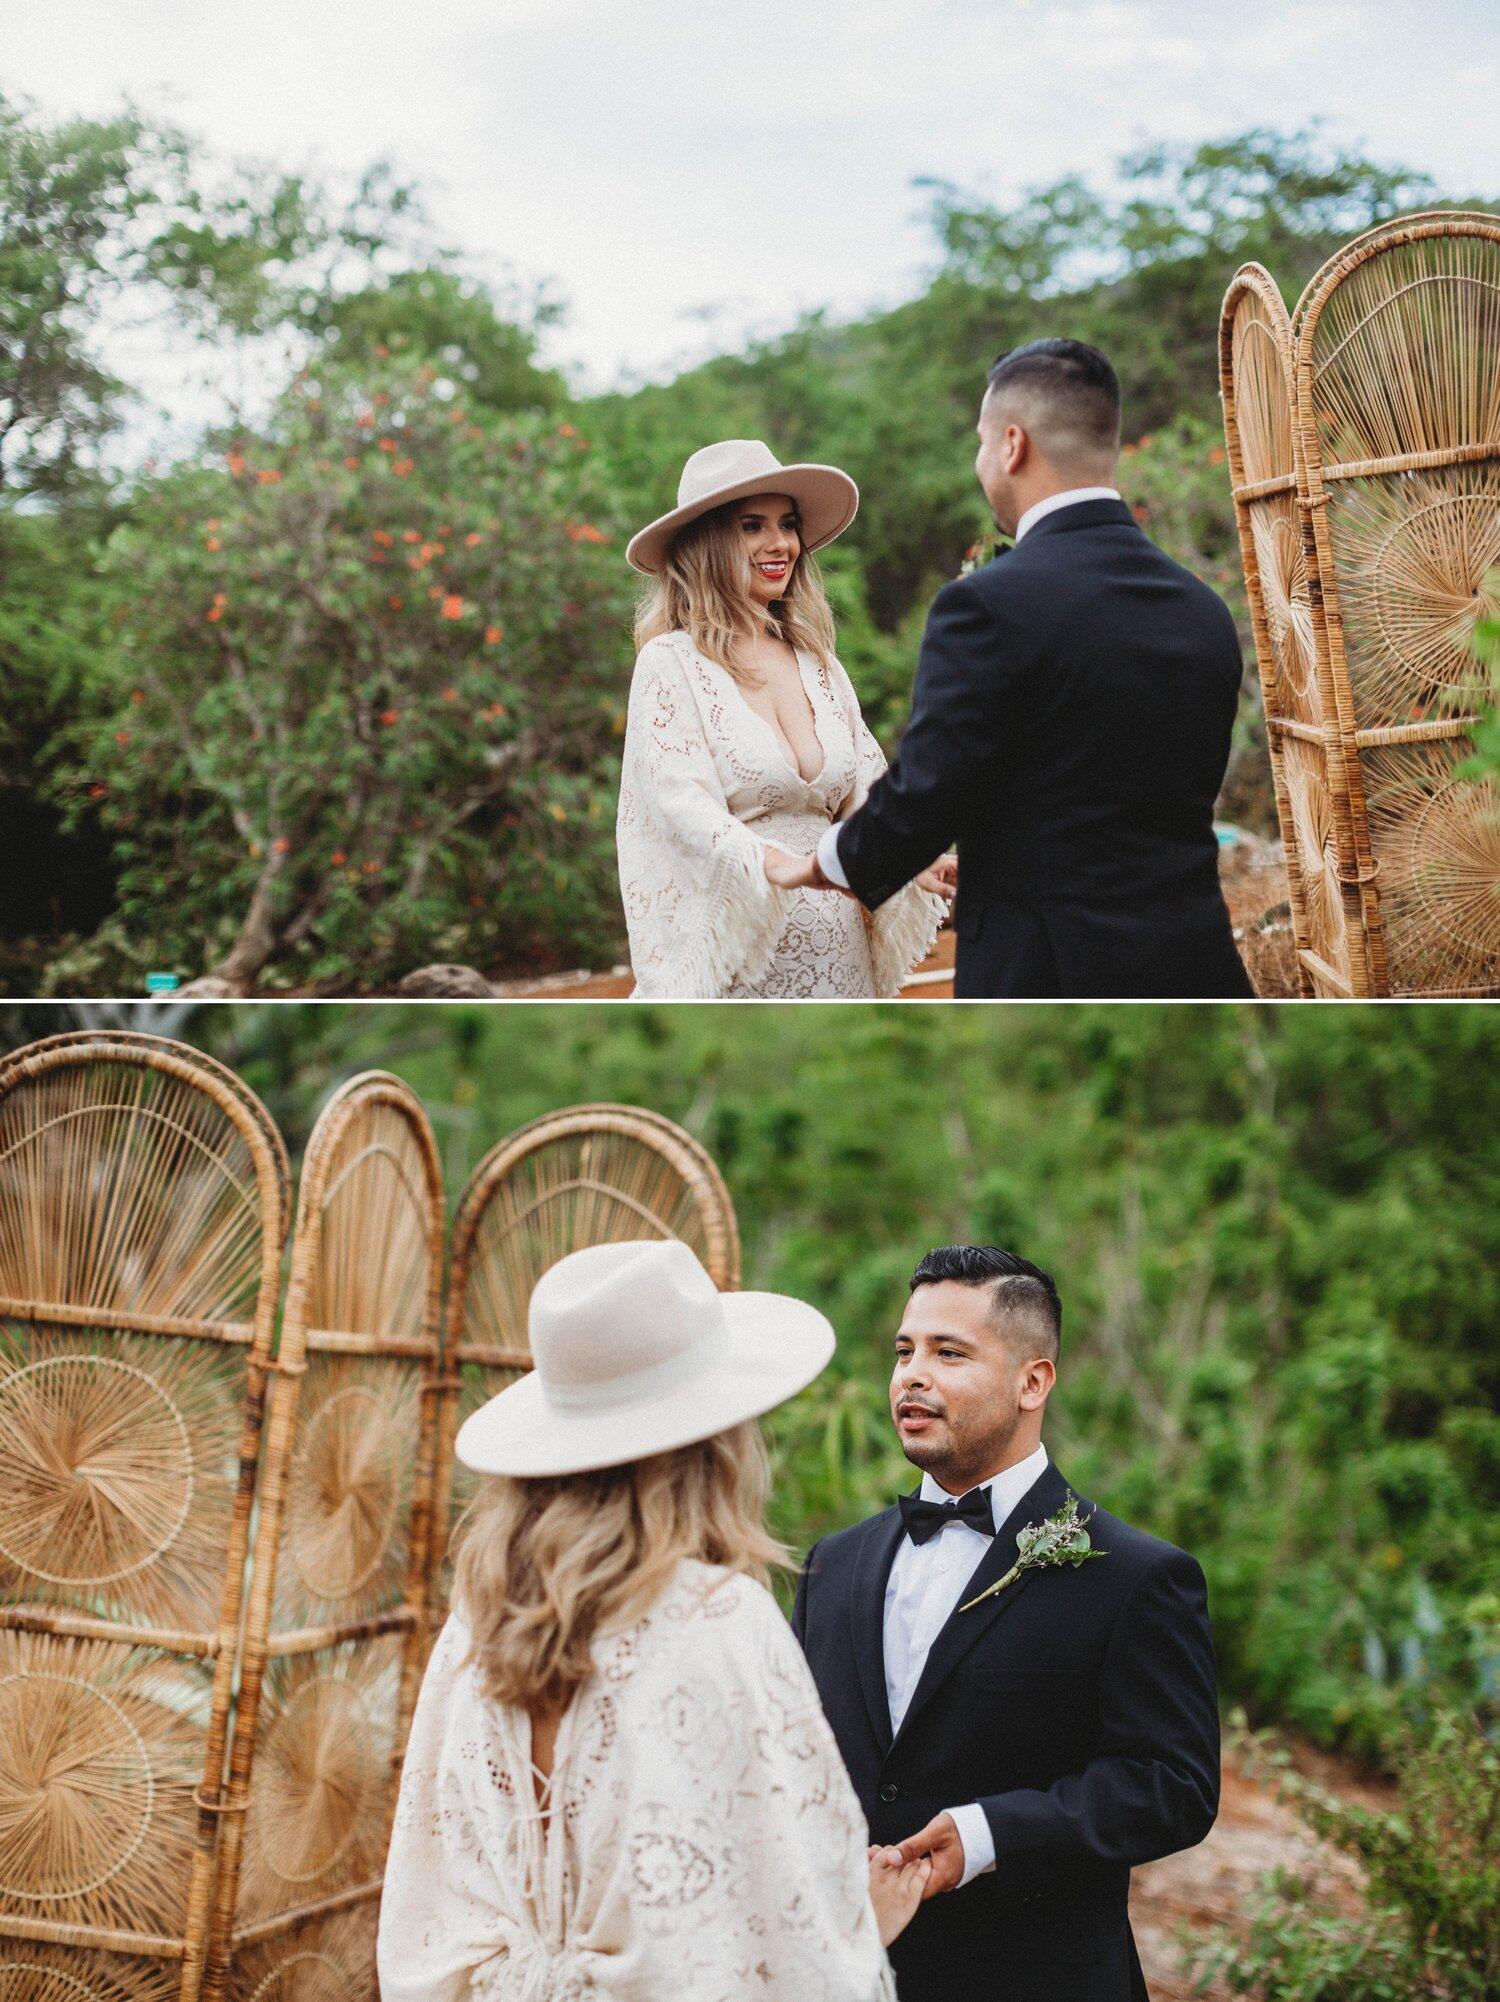 Boho Cactus Elopement - Honolulu, Koko Crater Botanical Garden - Oahu Hawaii Wedding Photographer 17.jpg